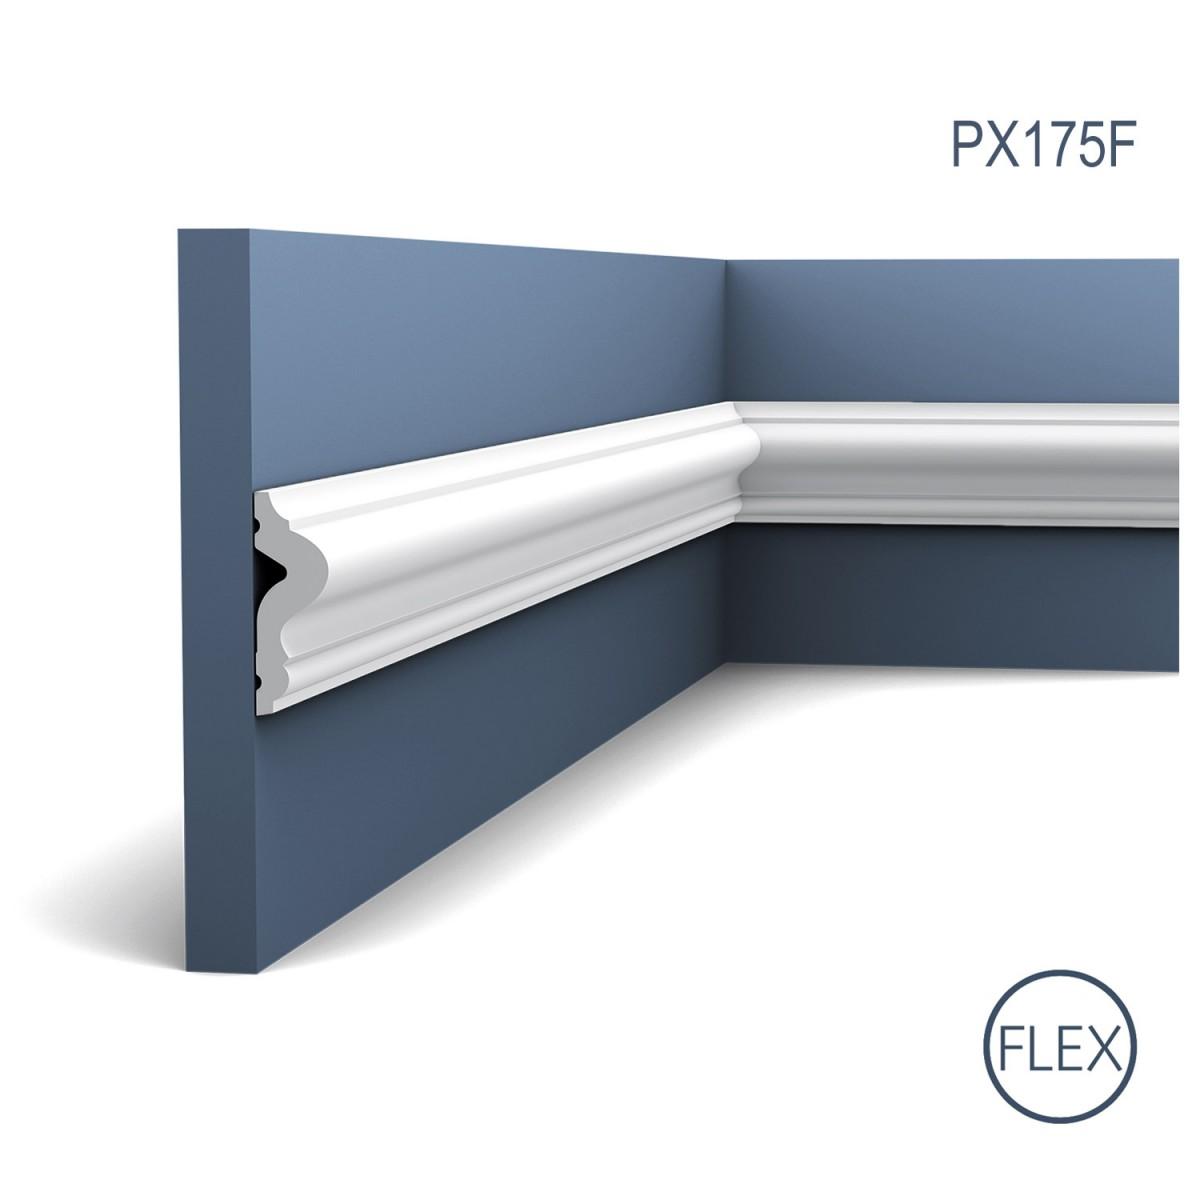 Brau Flex Axxent PX175F, Dimensiuni: 200 X 1.7 X 5 cm, Orac Decor